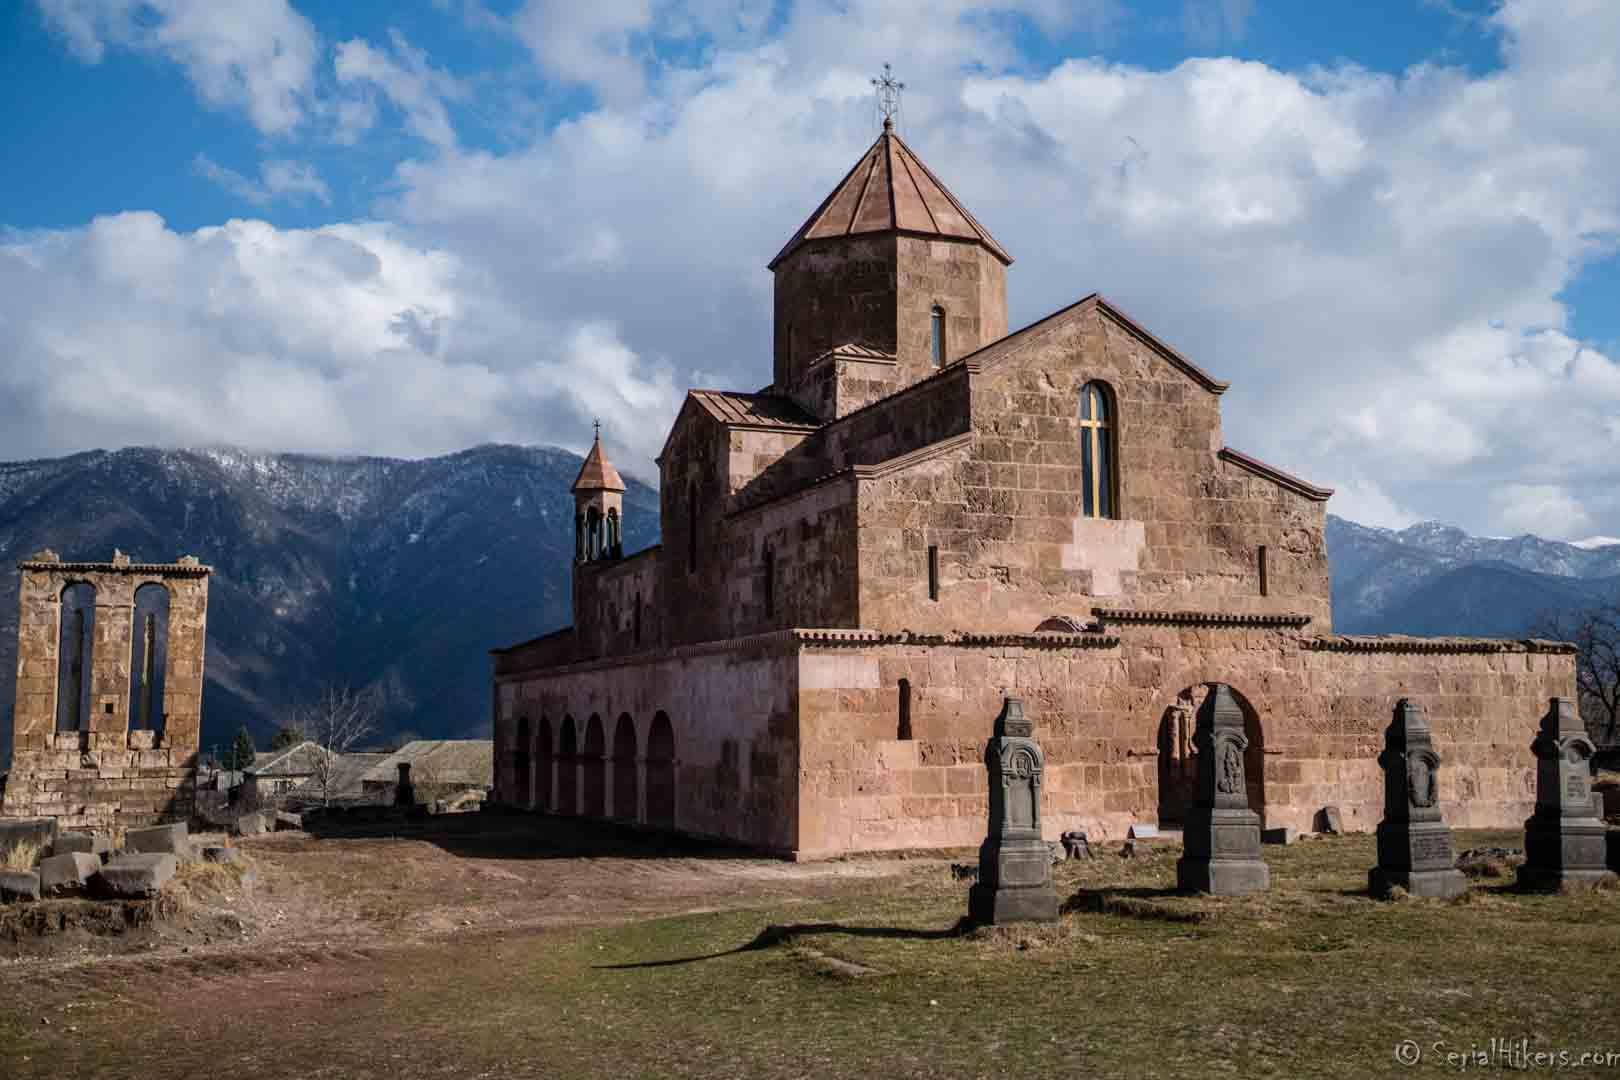 SerialHikers stop autostop world monde tour hitchhiking aventure adventure alternative travel voyage sans avion no fly caucase caucasian armenia armenie Odzun monastery monastère